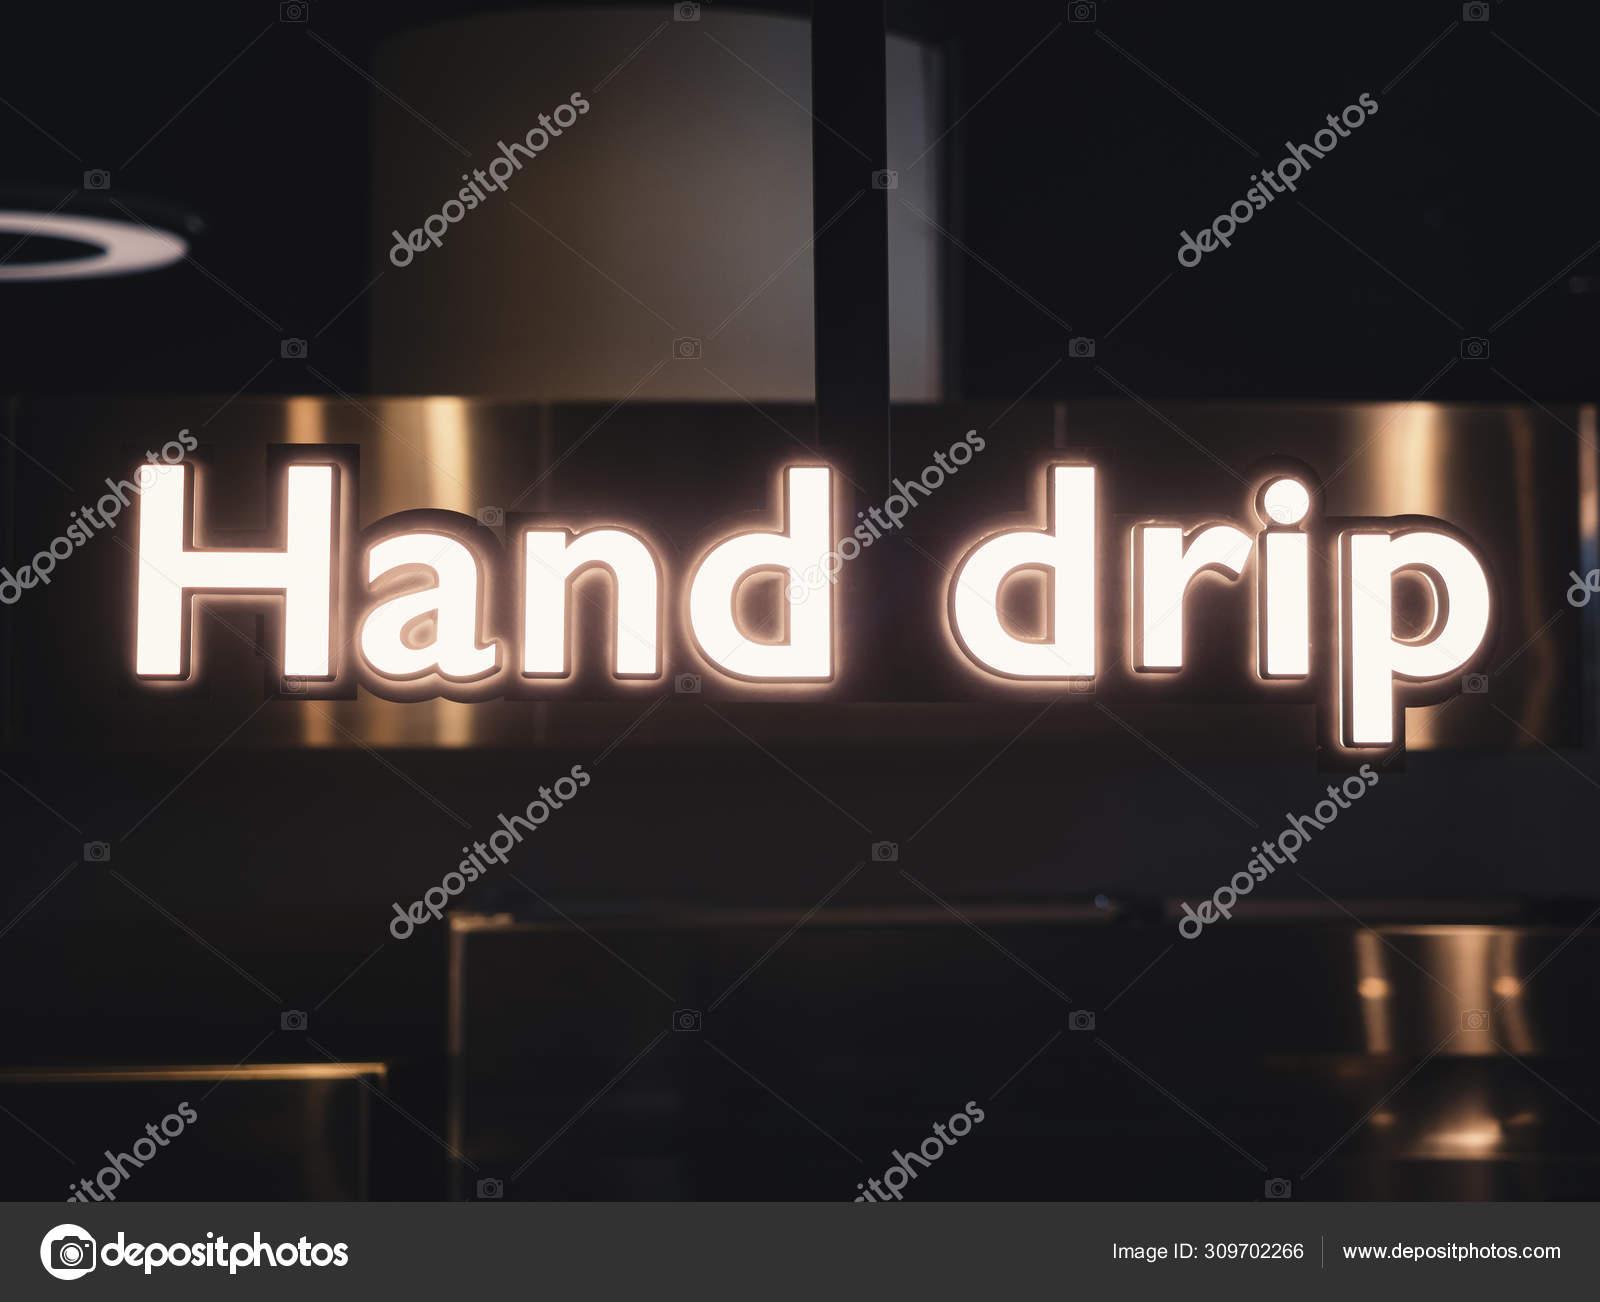 Hand Drip Neon Sign Coffee Shop Cafe Modern Signage Decoration Stock Photo C Viteethumb 309702266